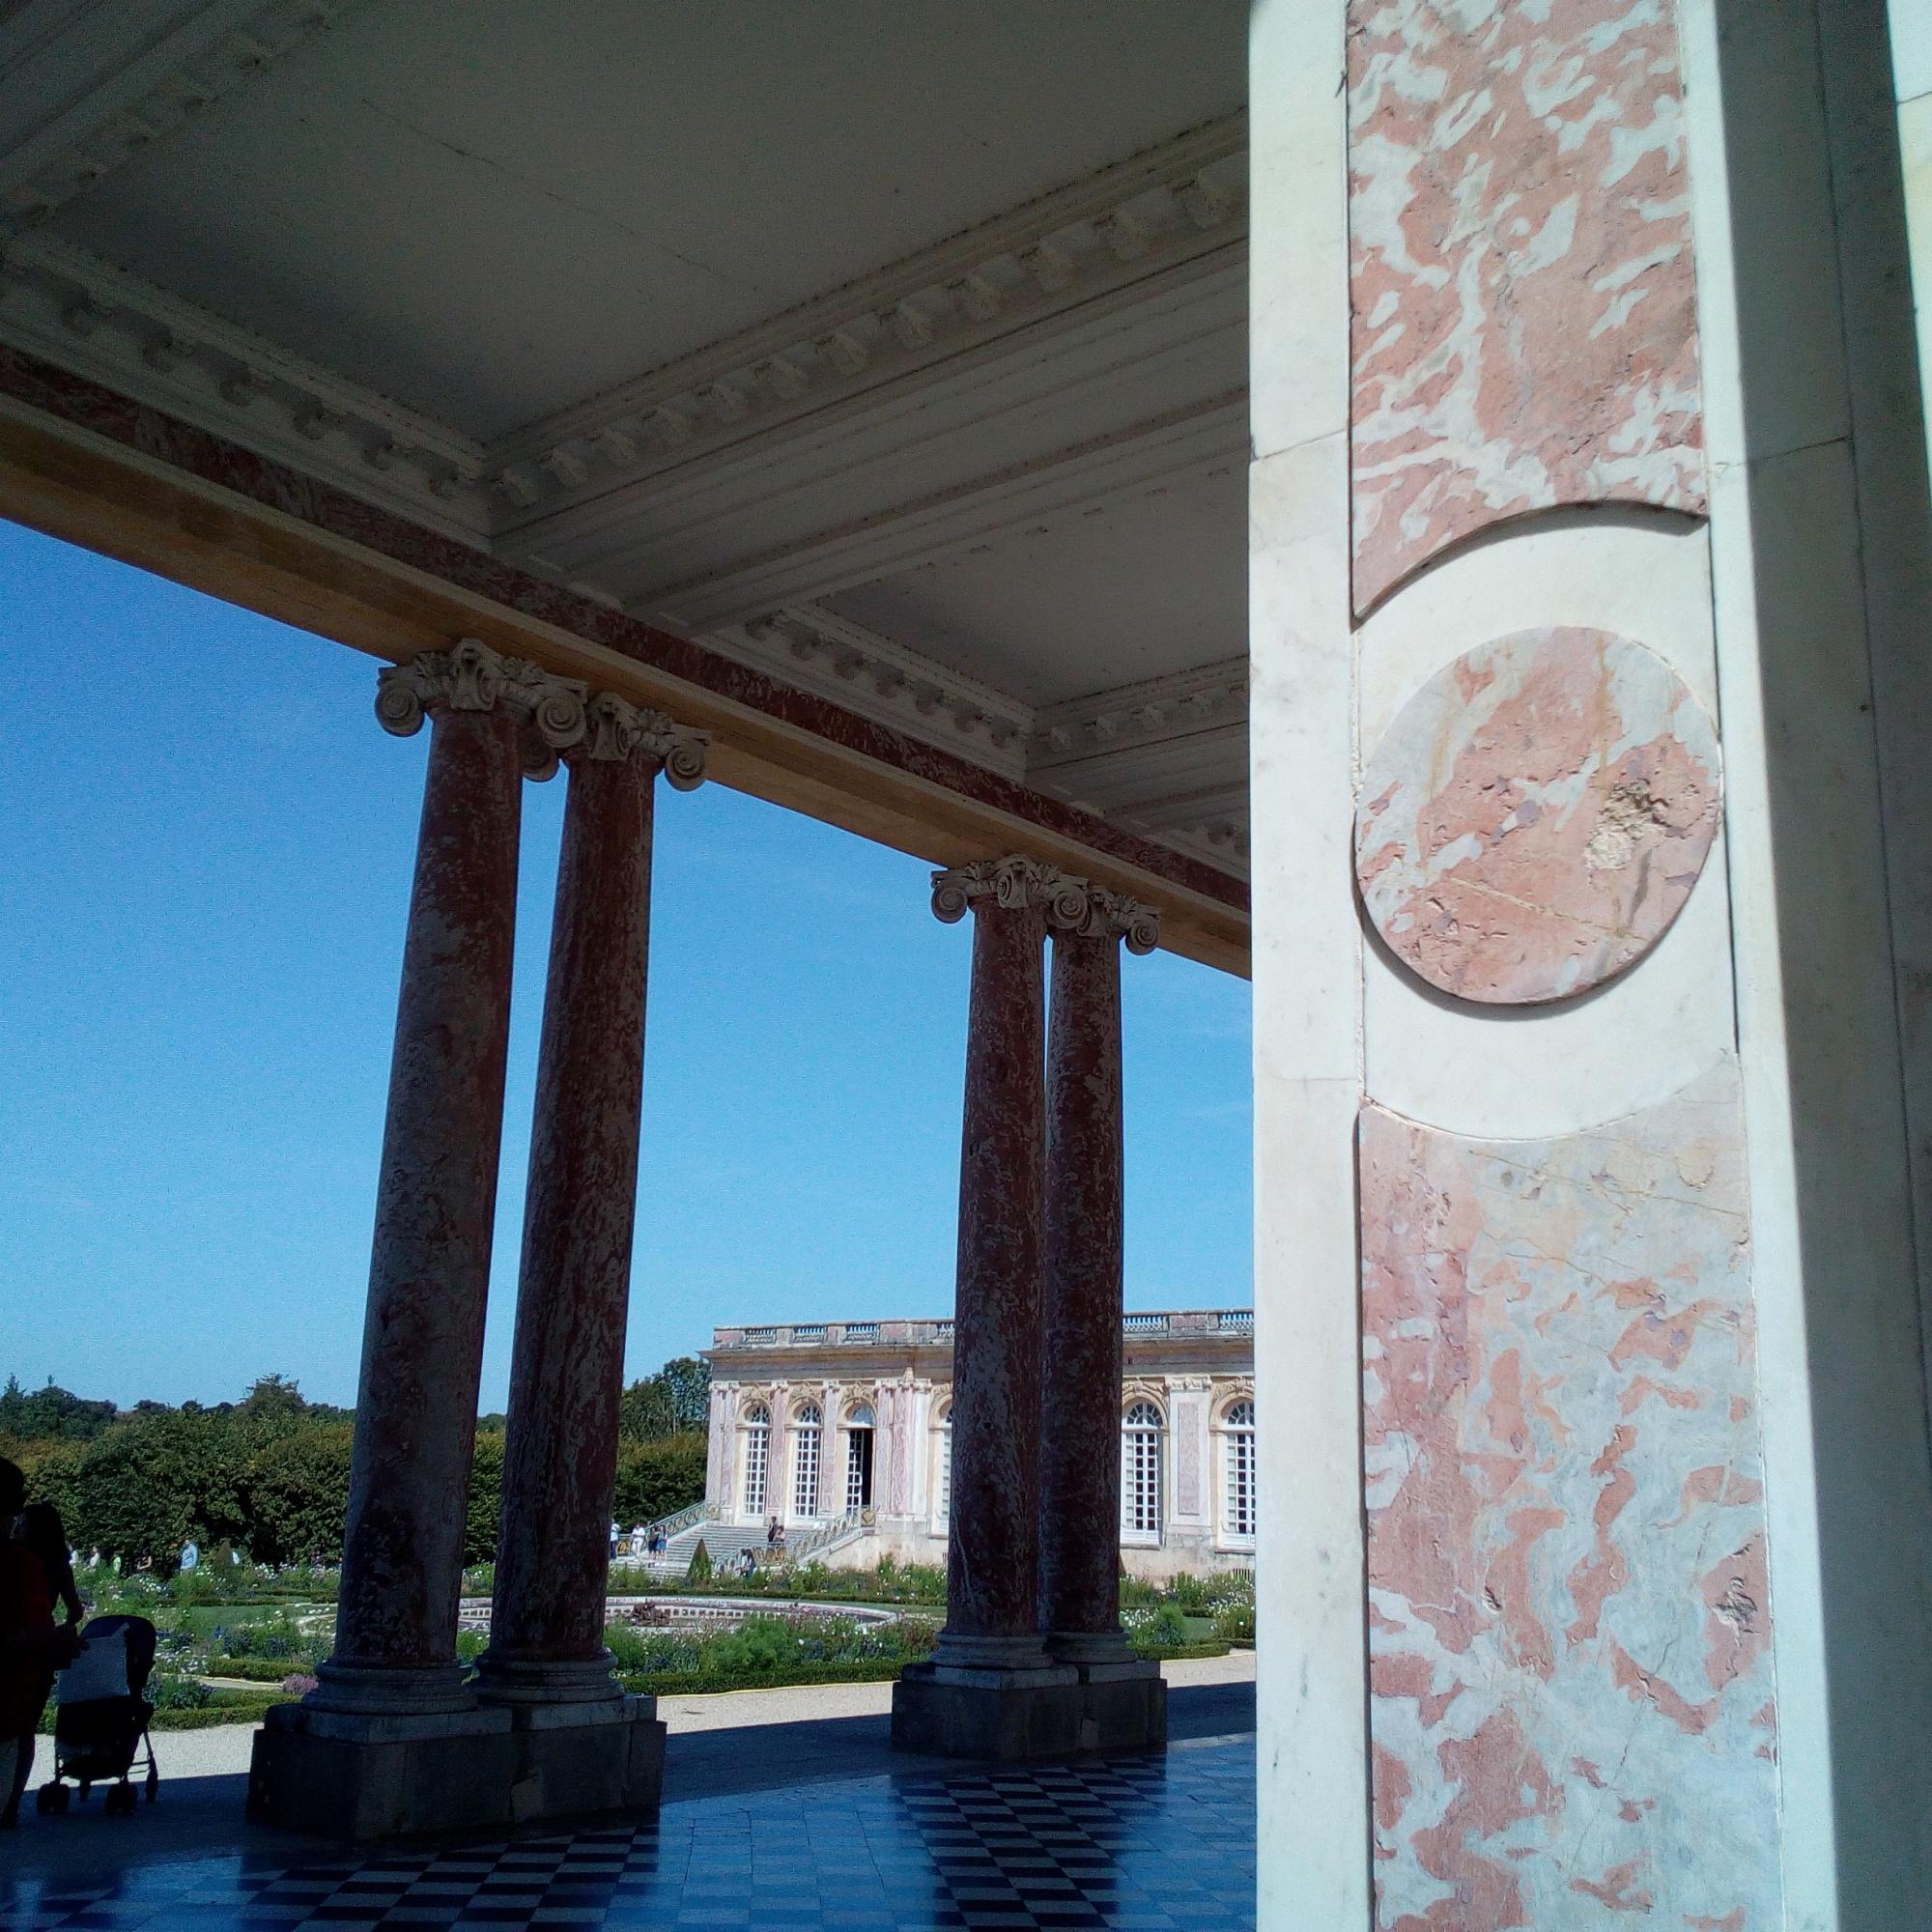 Le péristyle du Grand Trianon